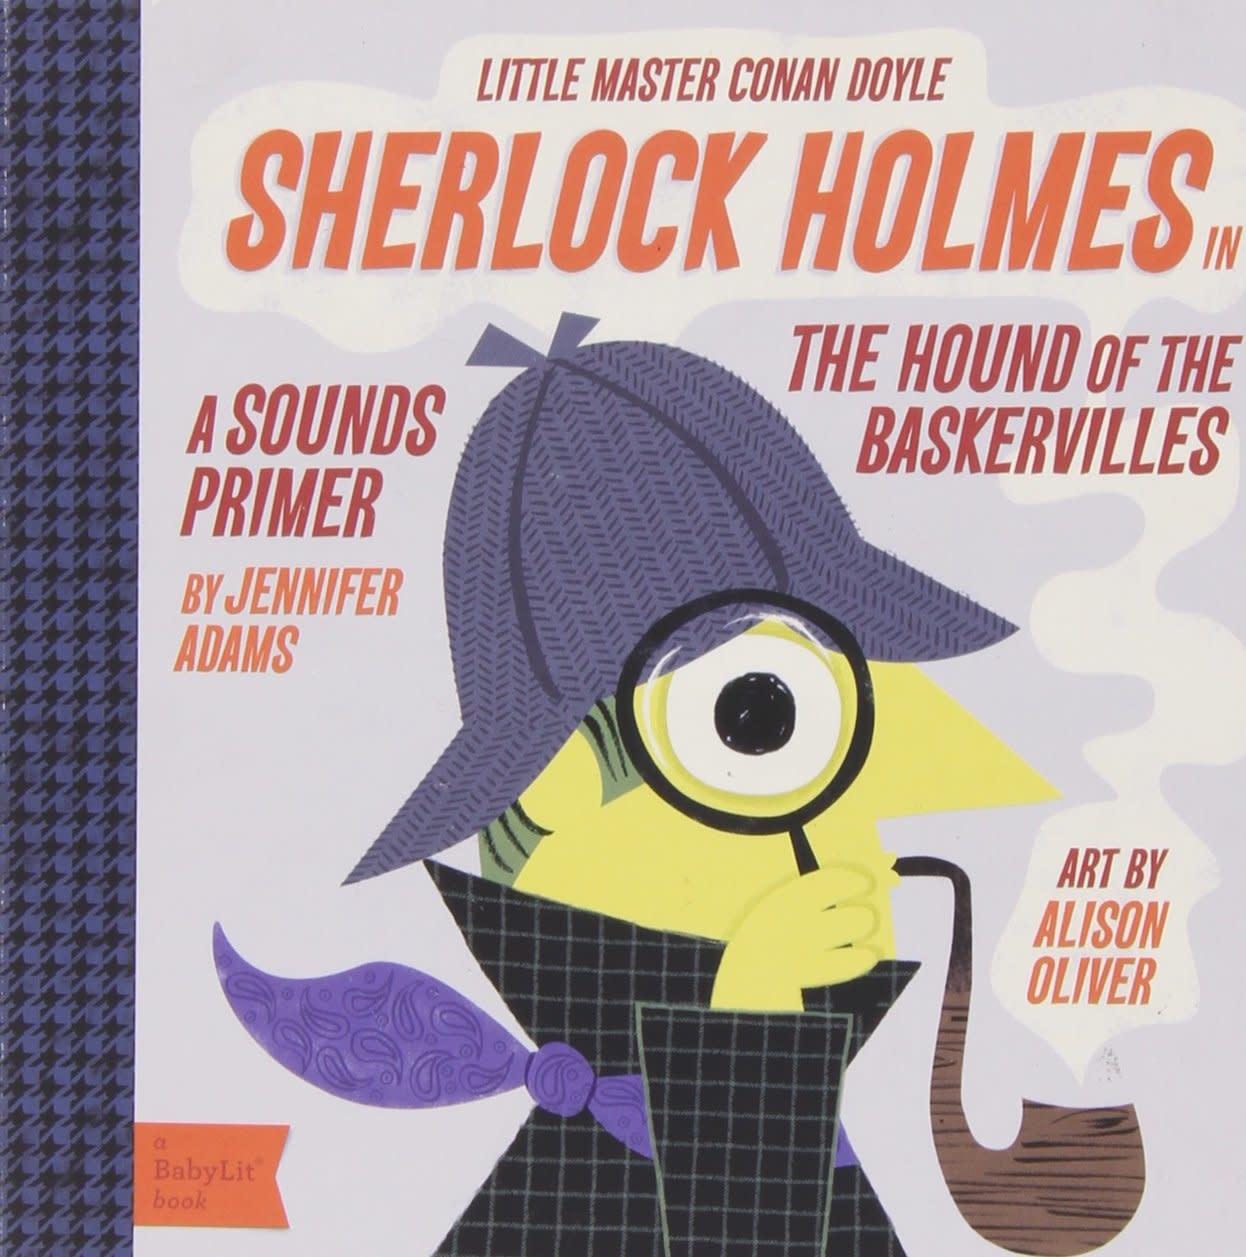 Sherlock Holmes A Sounds Primer